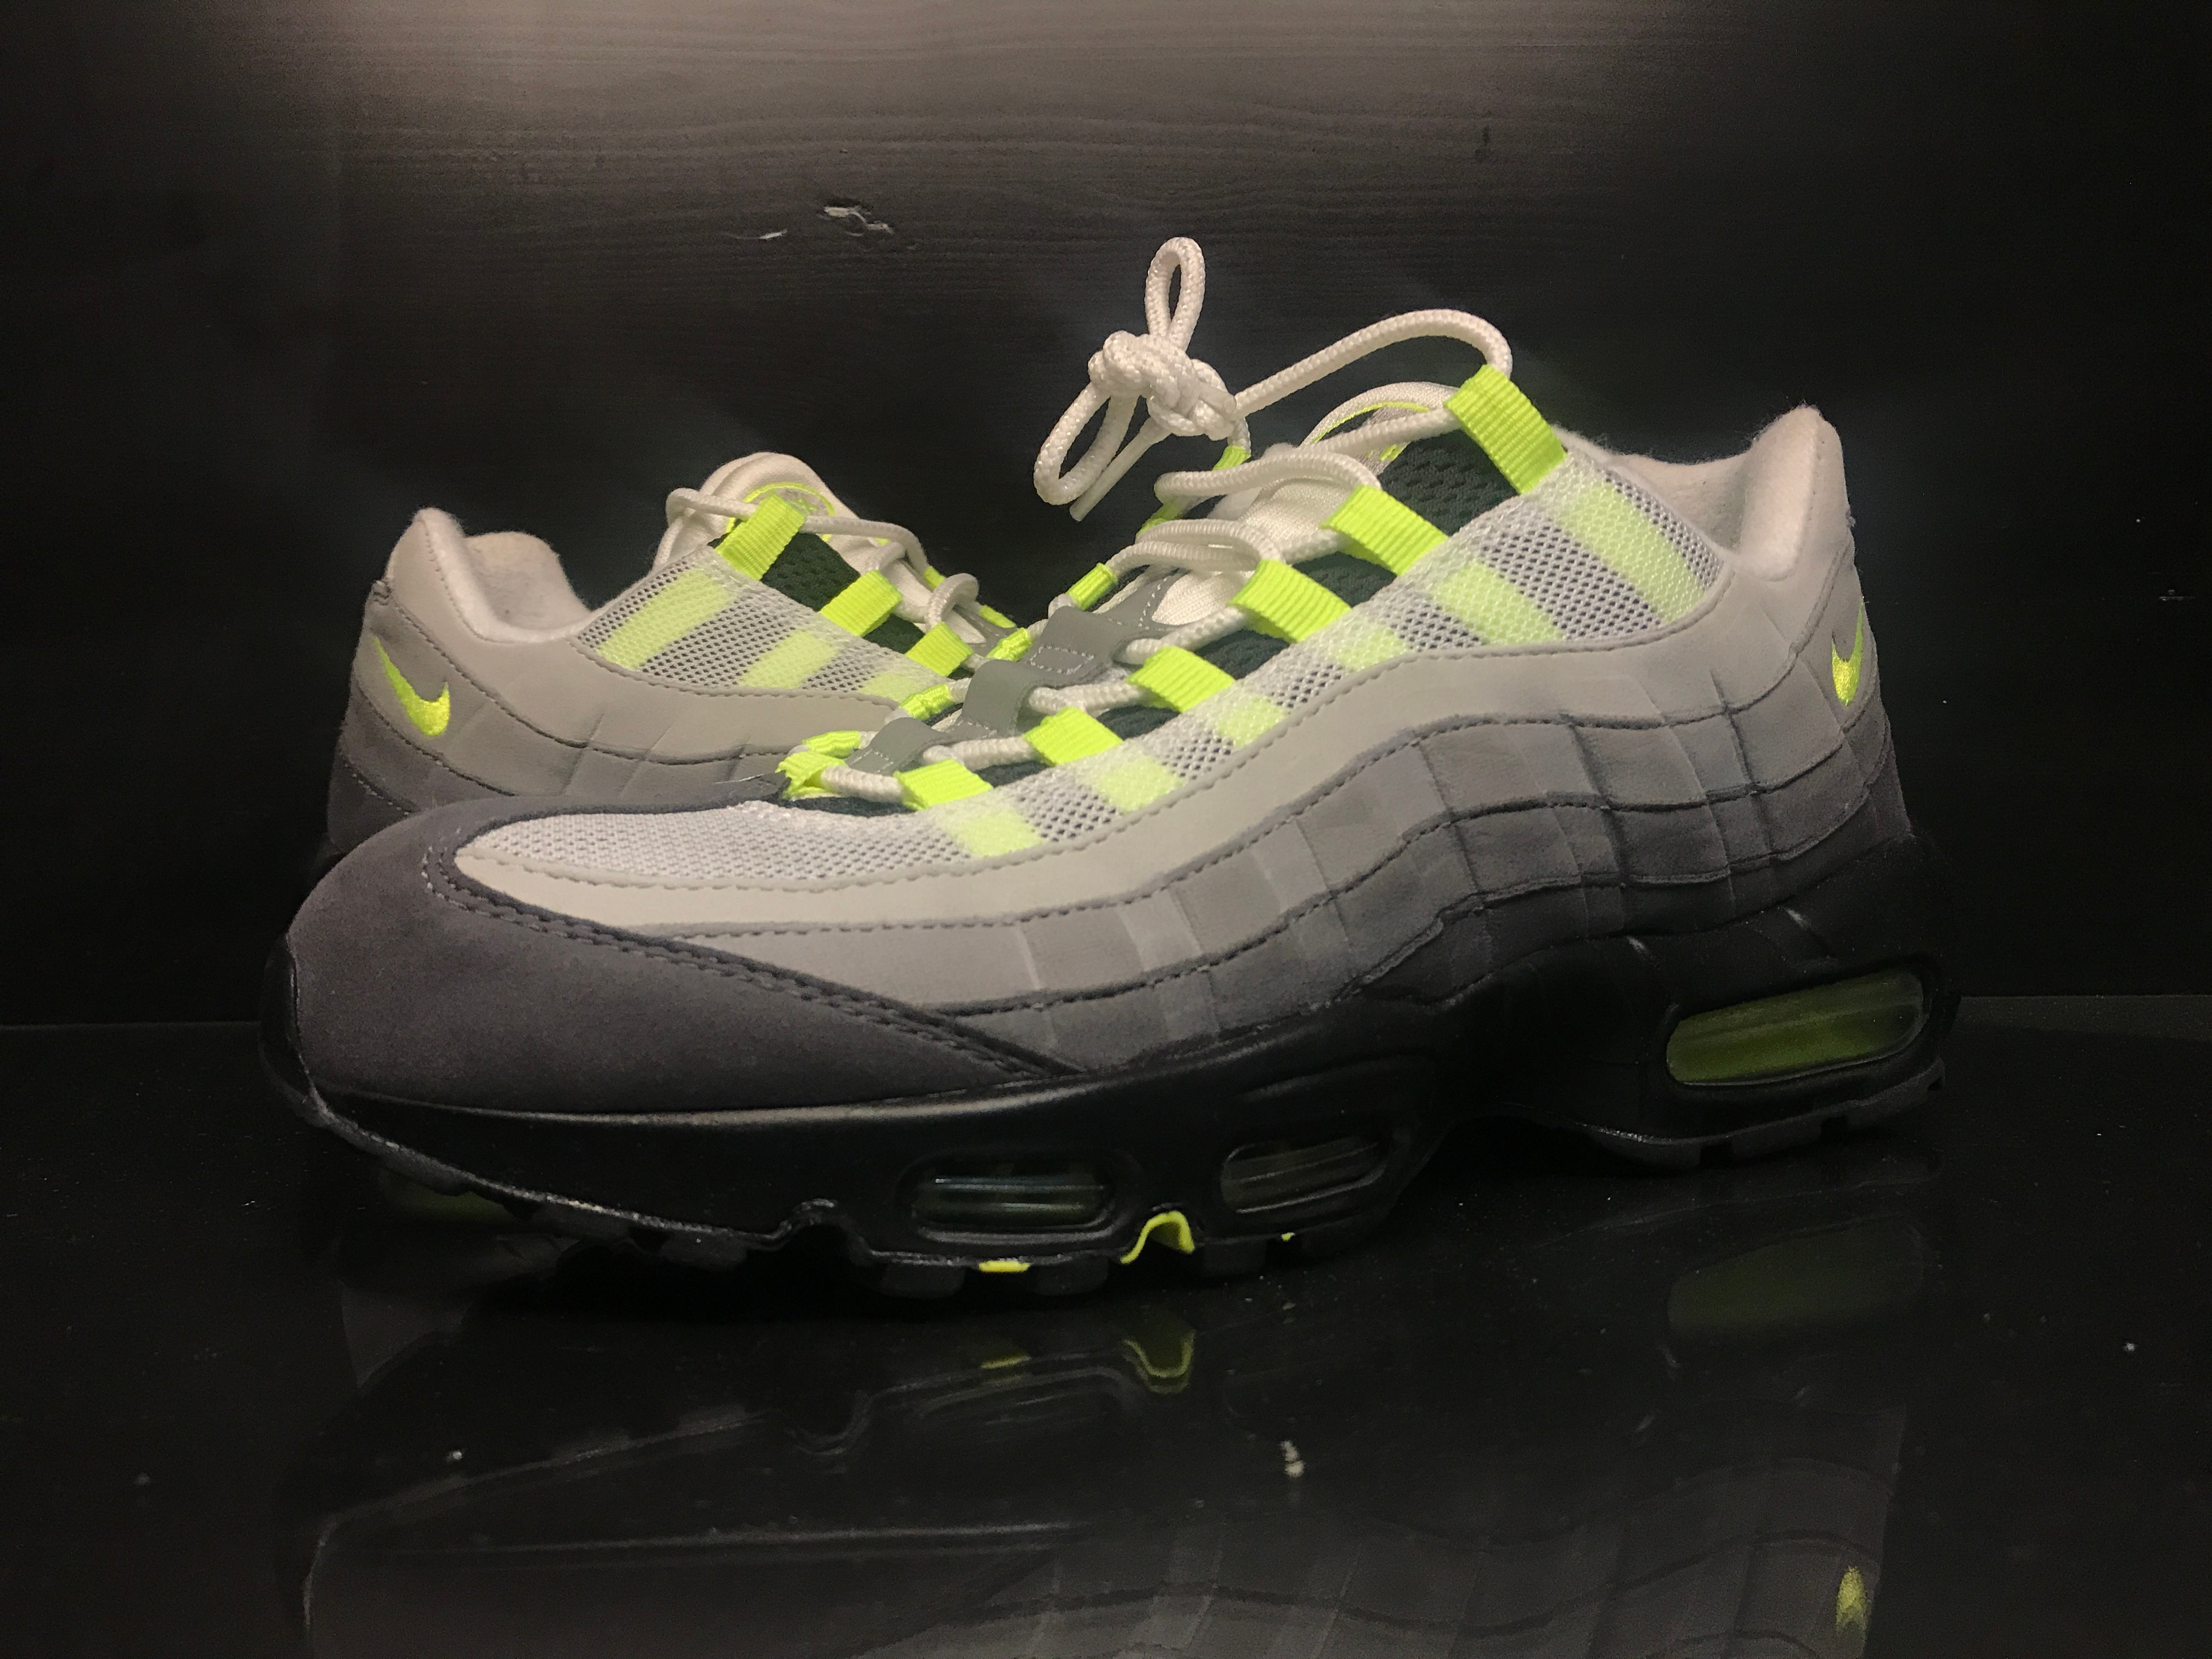 Nike Air Max 85 Neon Grn 10 | illerylb